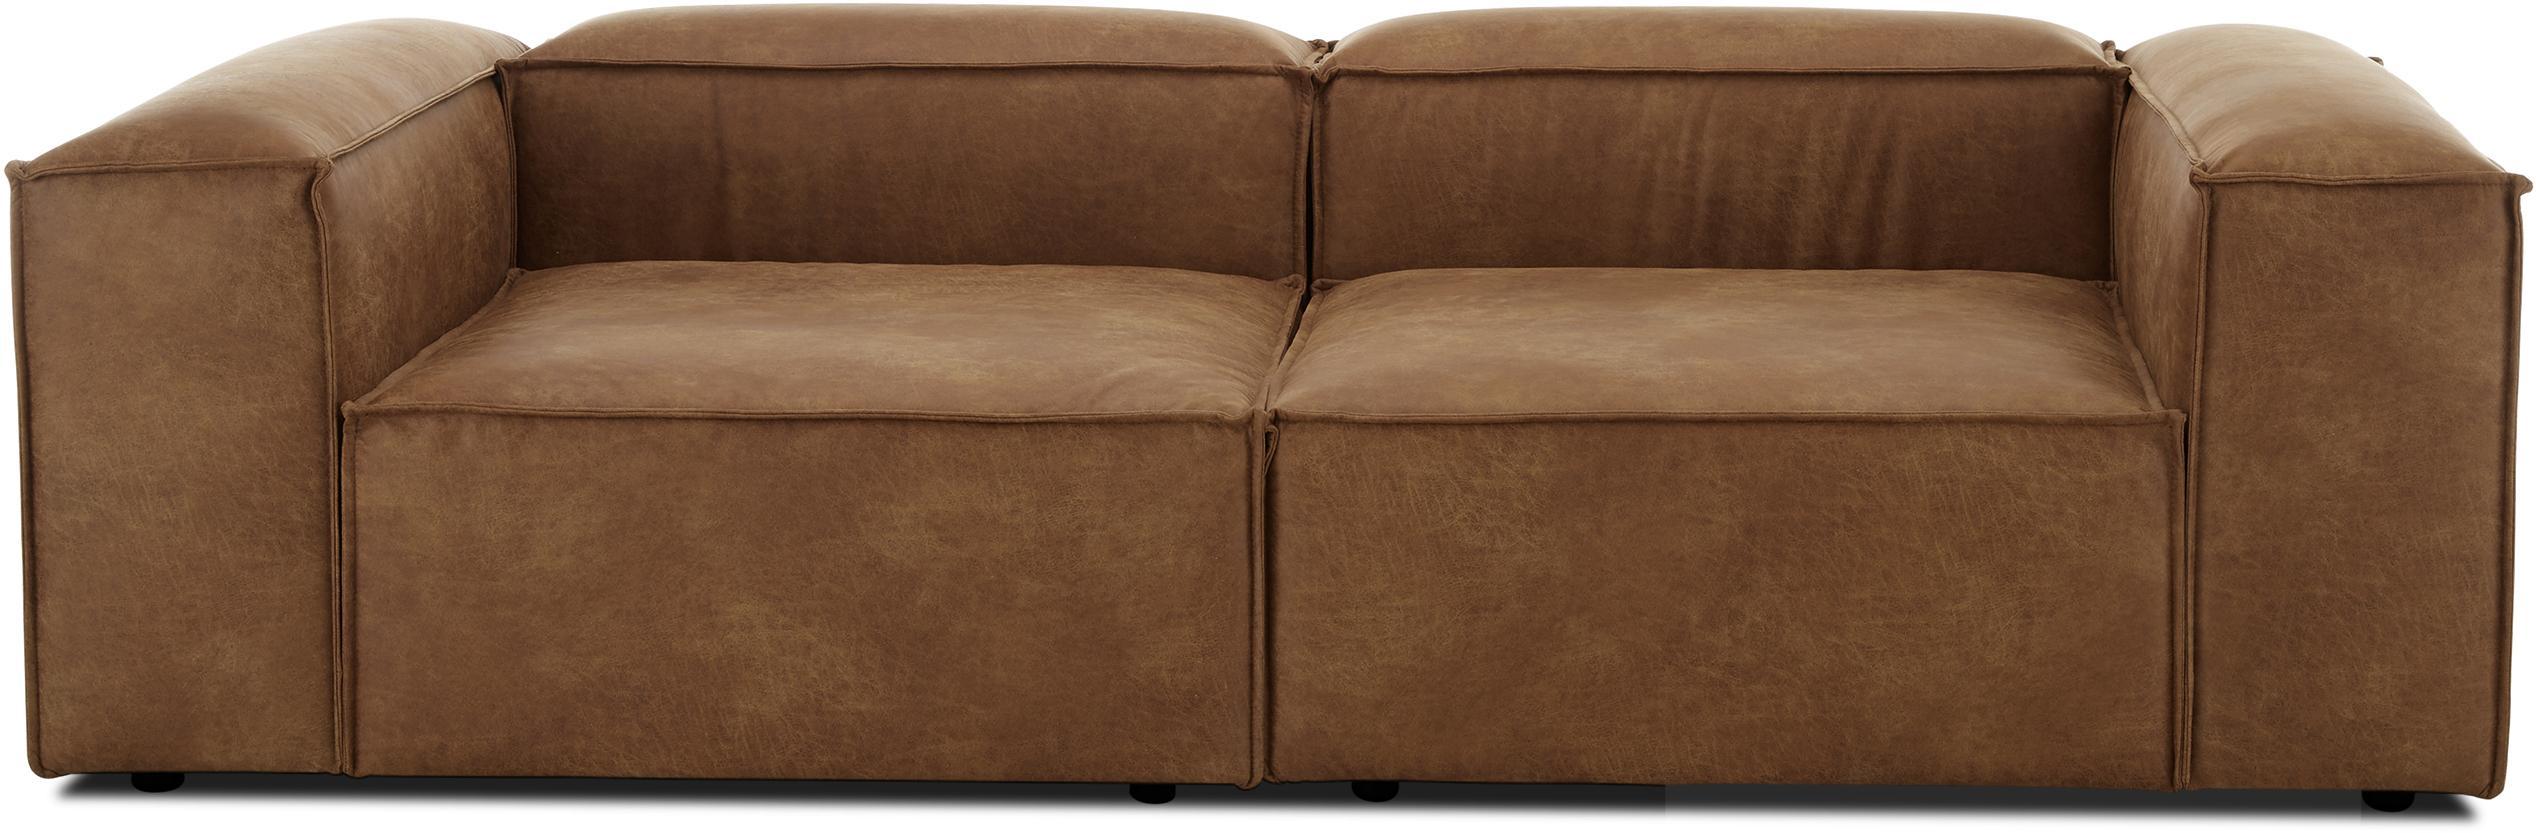 Sofá modular de cuero Lennon (3plazas), Tapizado: cuero reciclado (70% cuer, Estructura: madera de pino maciza, ma, Patas: plástico, Cuero marrón, An 238 x F 119 cm